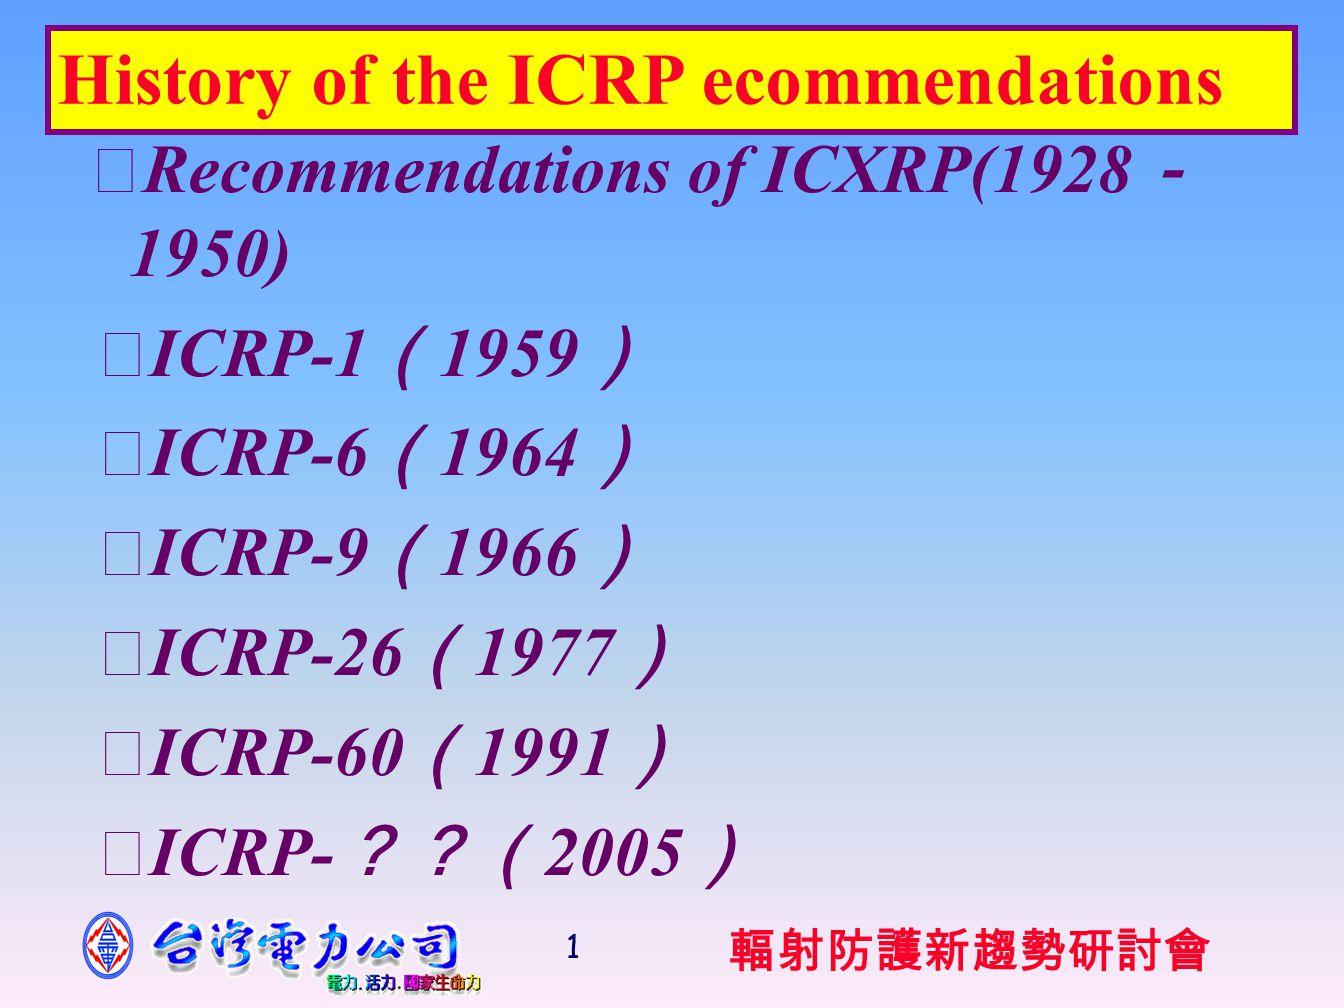 輻射防護新趨勢研討會 1 ‧ Recommendations of ICXRP(1928 - 1950) ‧ ICRP-1 ( 1959 ) ‧ ICRP-6 ( 1964 ) ‧ ICRP-9 ( 1966 ) ‧ ICRP-26 ( 1977 ) ‧ ICRP-60 ( 1991 ) ‧ ICRP- ??( 2005 ) History of the ICRP ecommendations